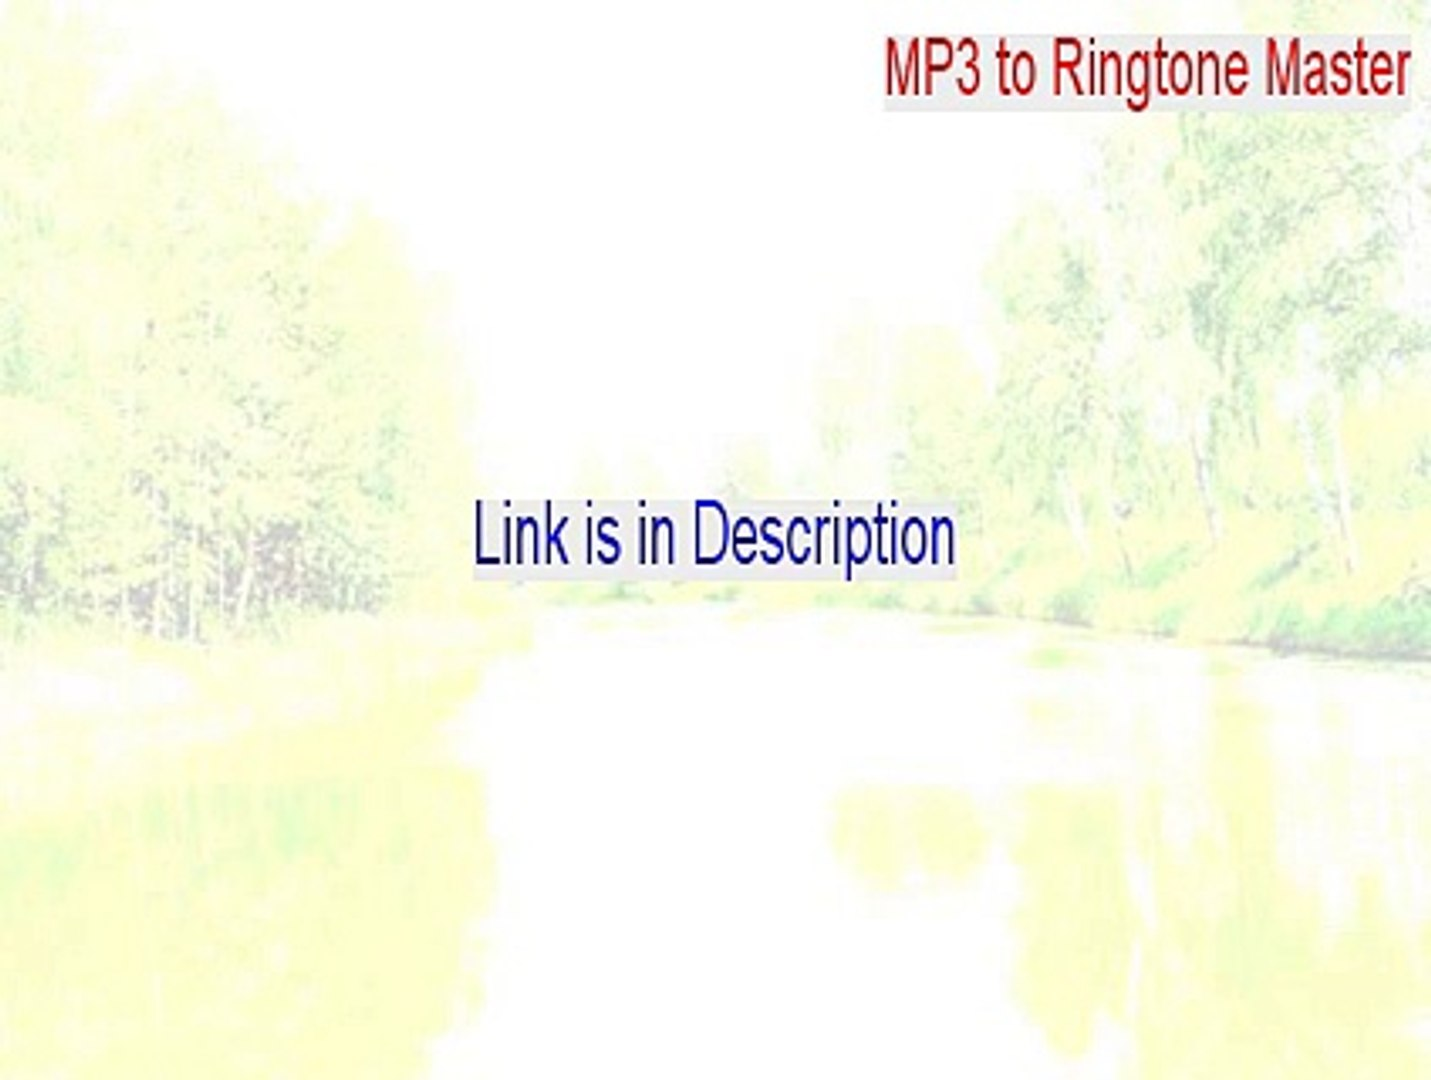 MP3 to Ringtone Master Crack (mp3 to ringtone master serial 2015)